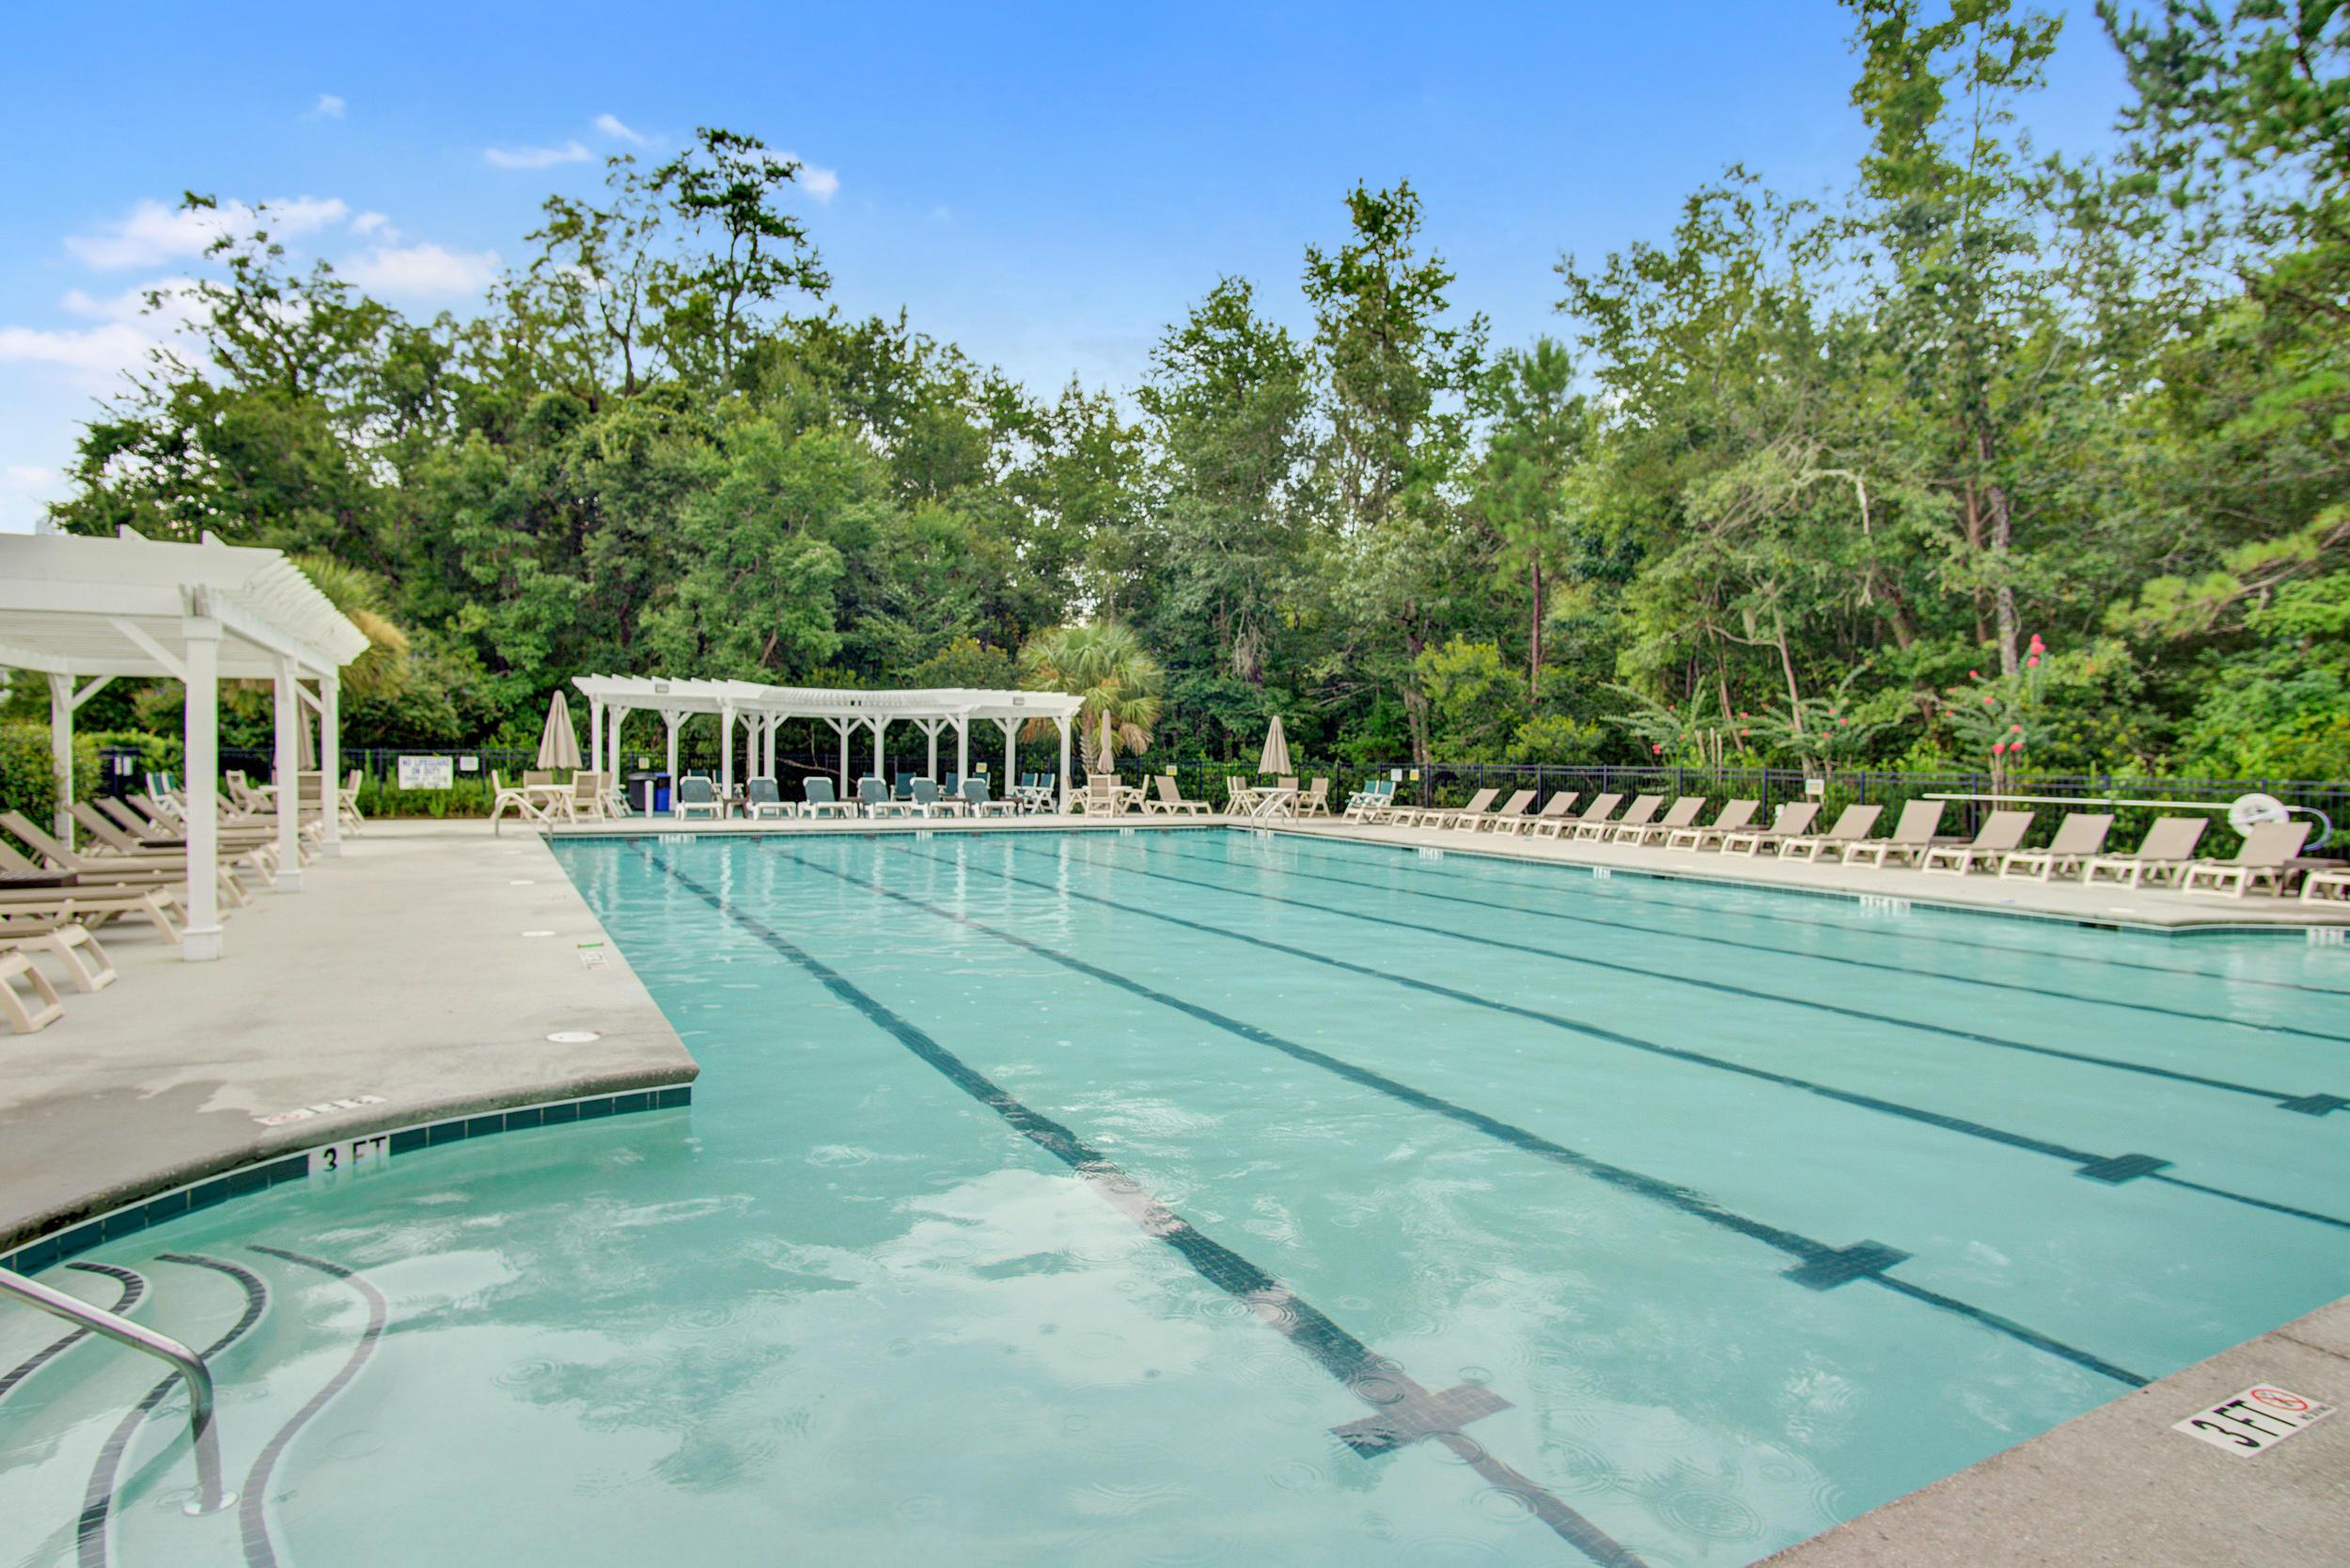 Legend Oaks Plantation Homes For Sale - 104 Sherry, Summerville, SC - 4